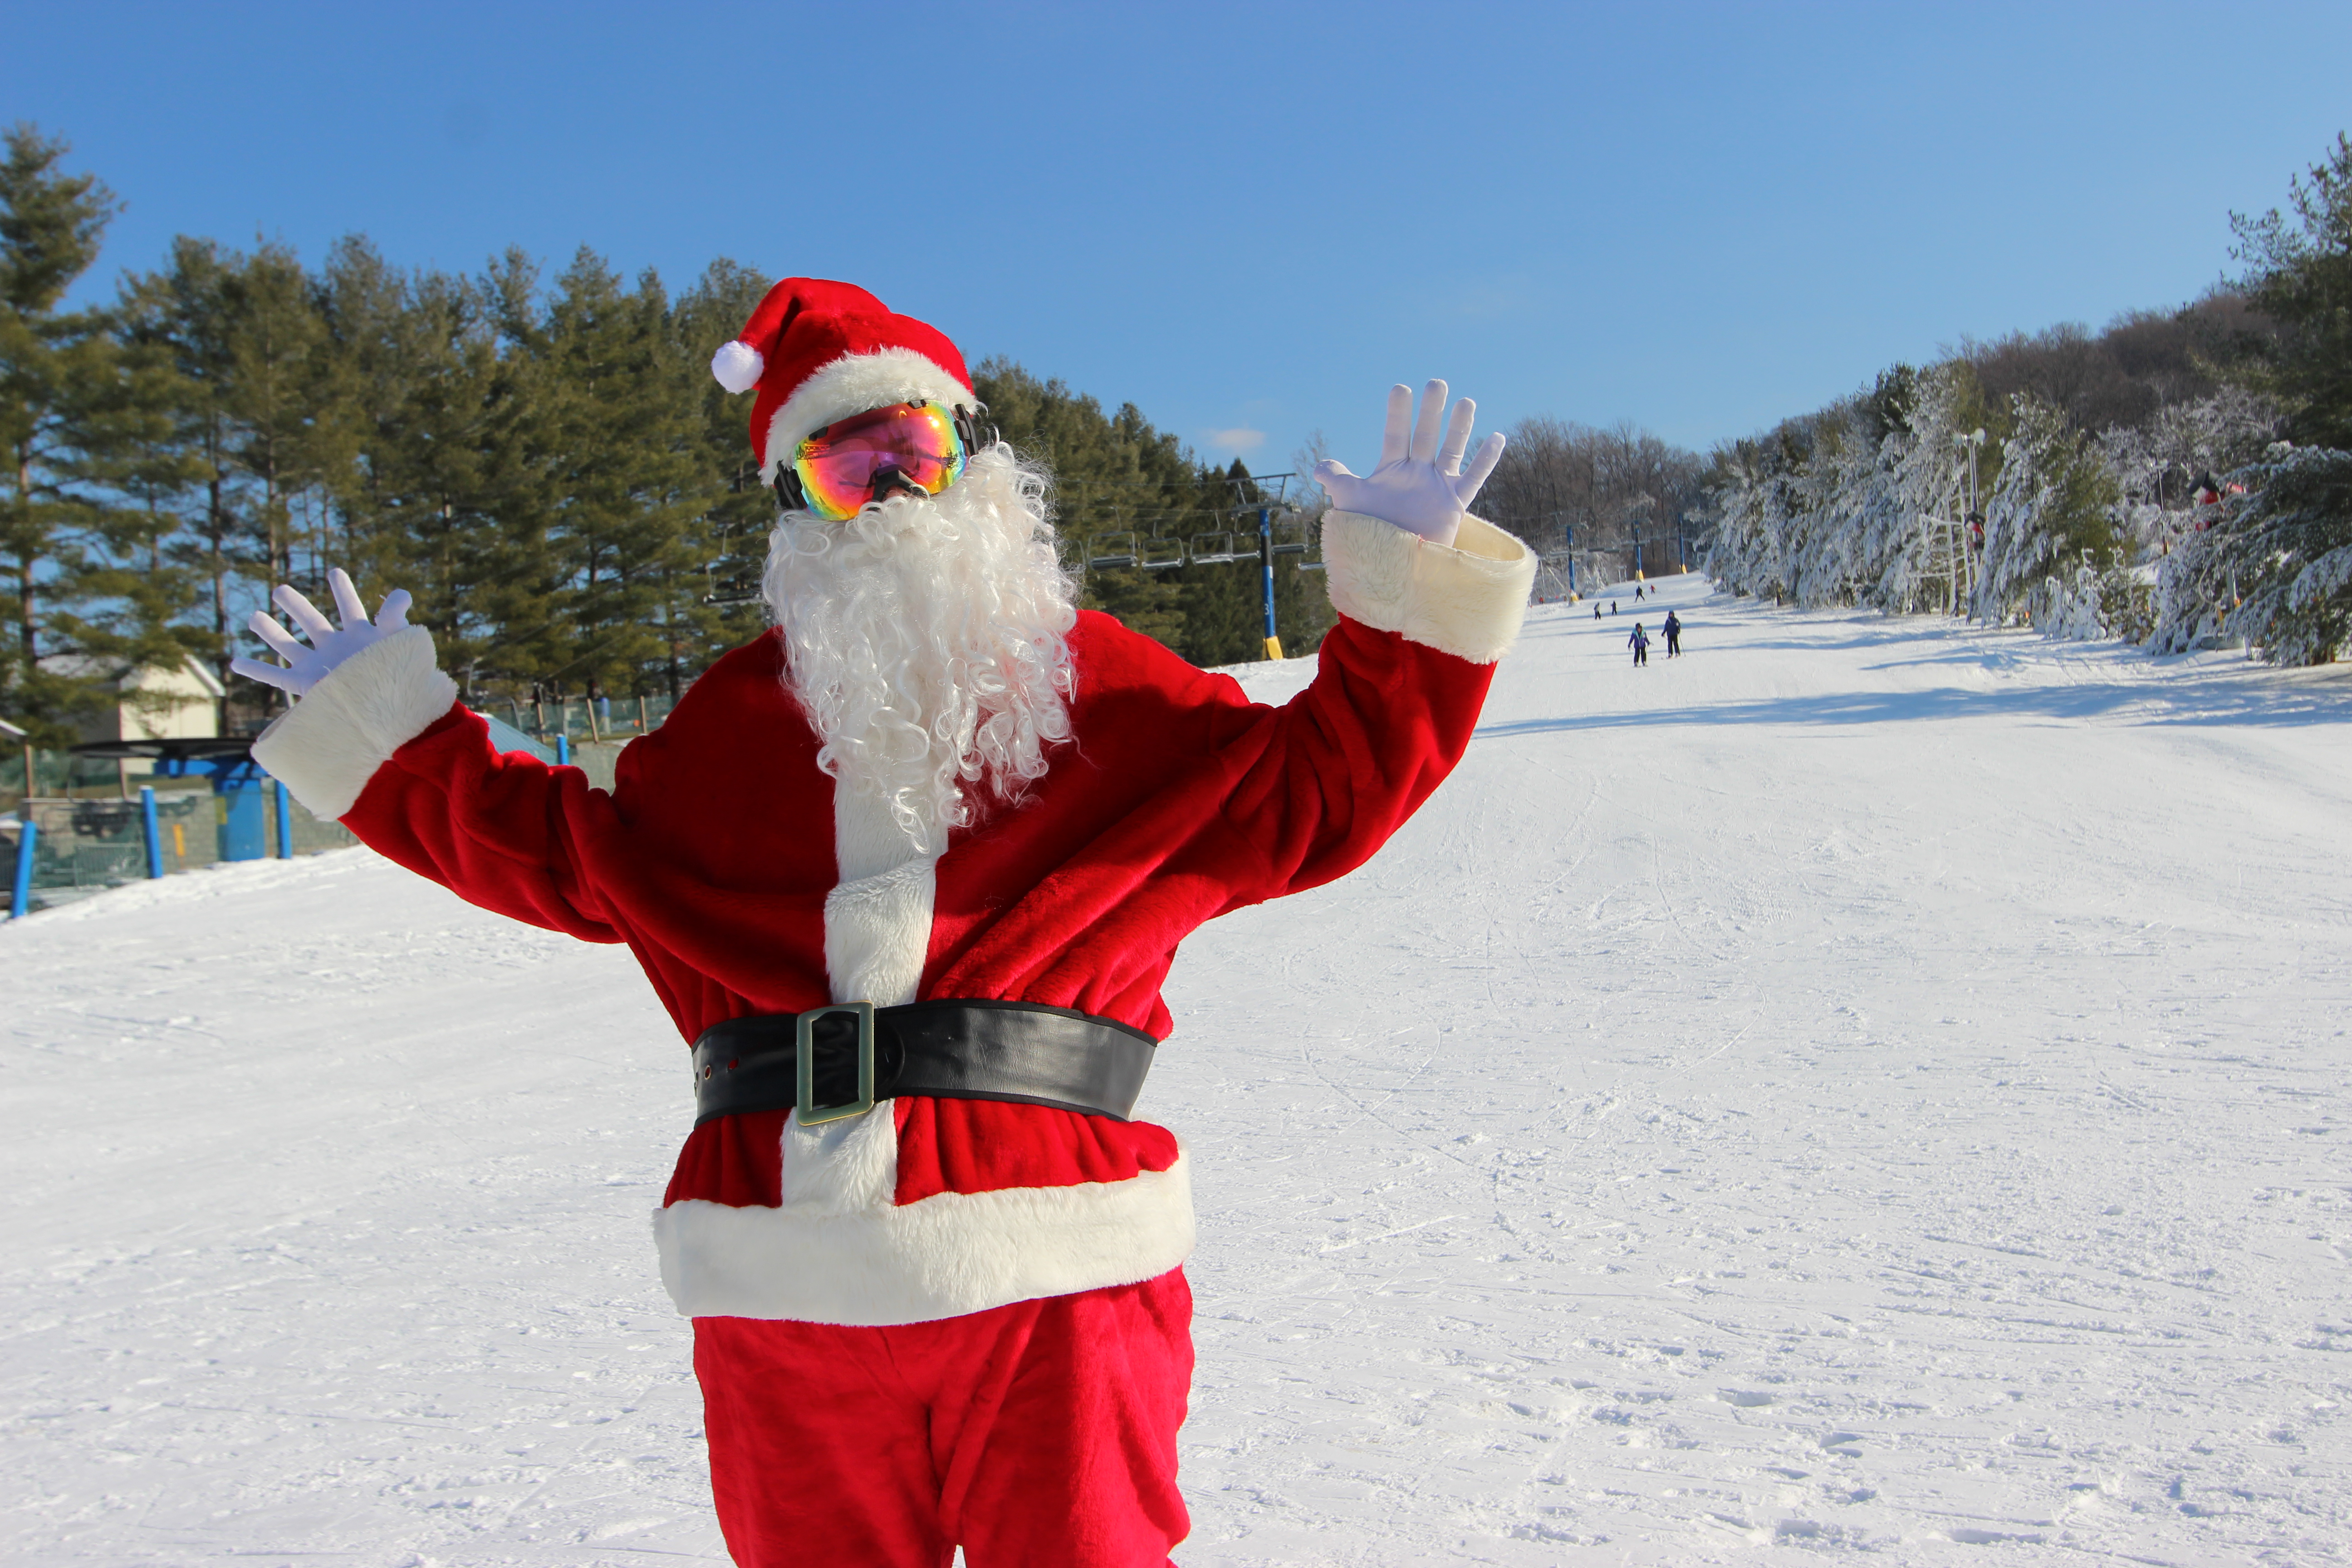 Holiday Events from Pennsylvania Ski Resorts Santa Claus